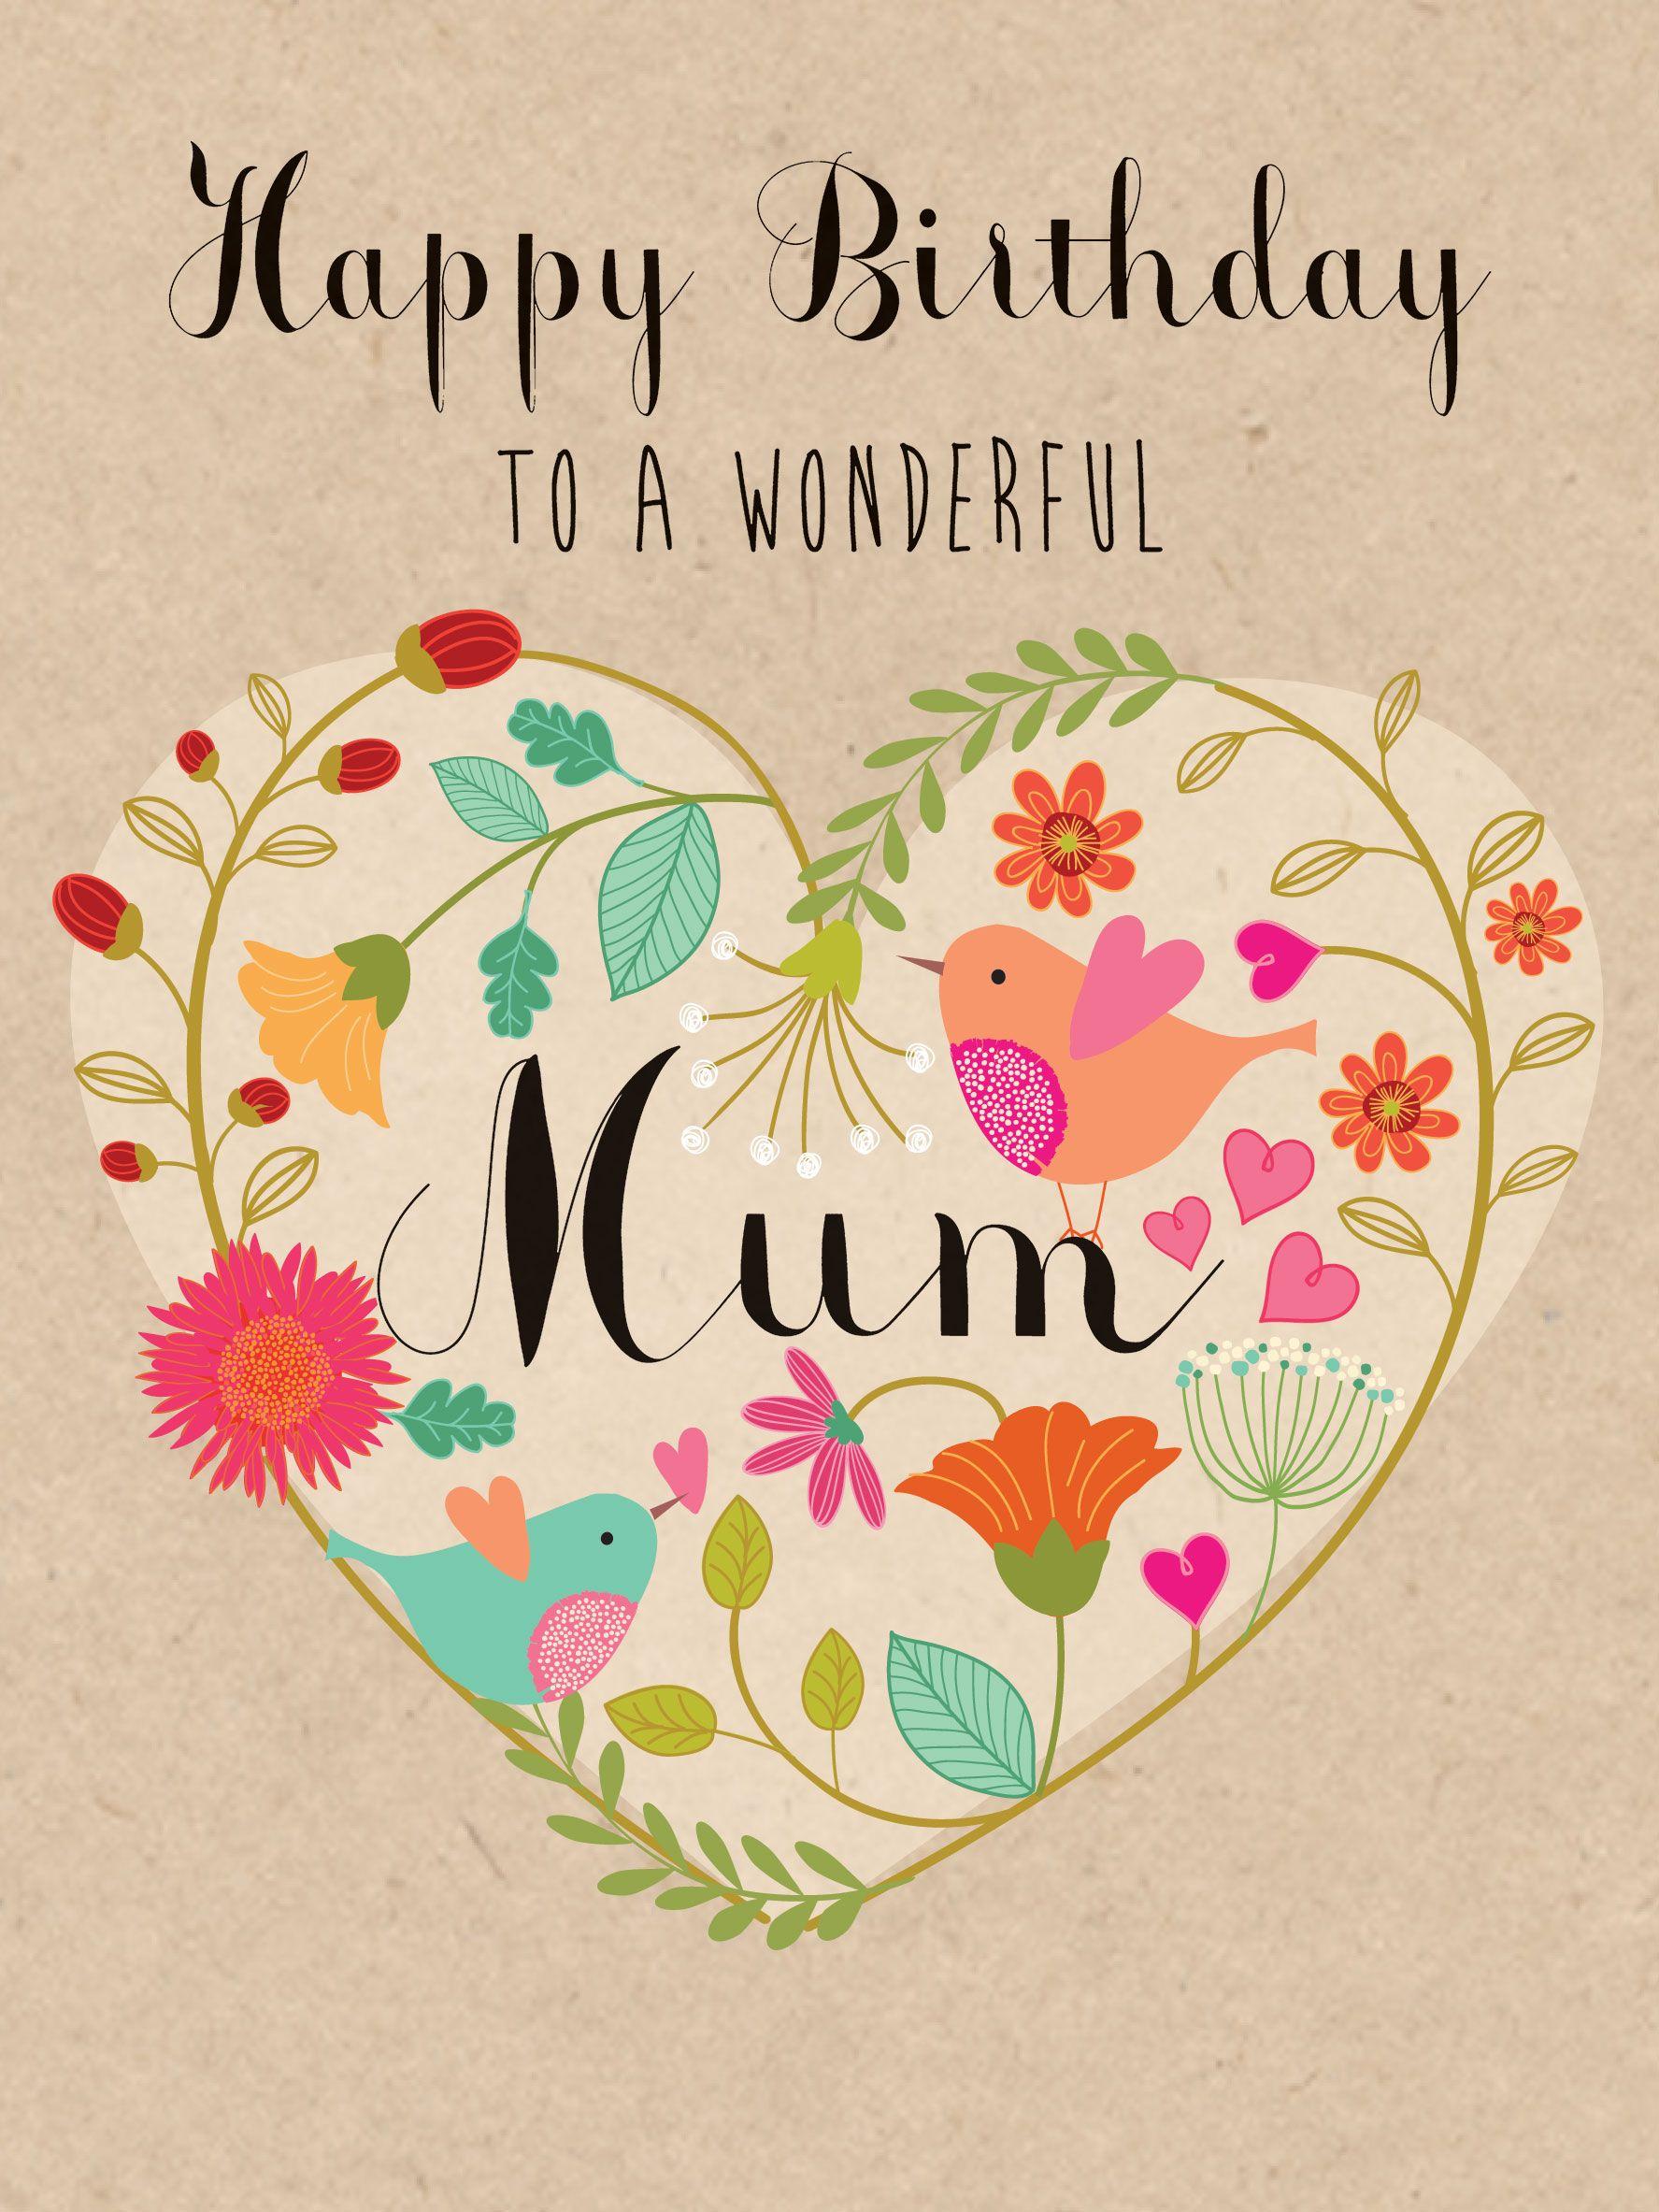 Happy Birthday To A Wonderful Mum W457 Birthday Luxury Card By